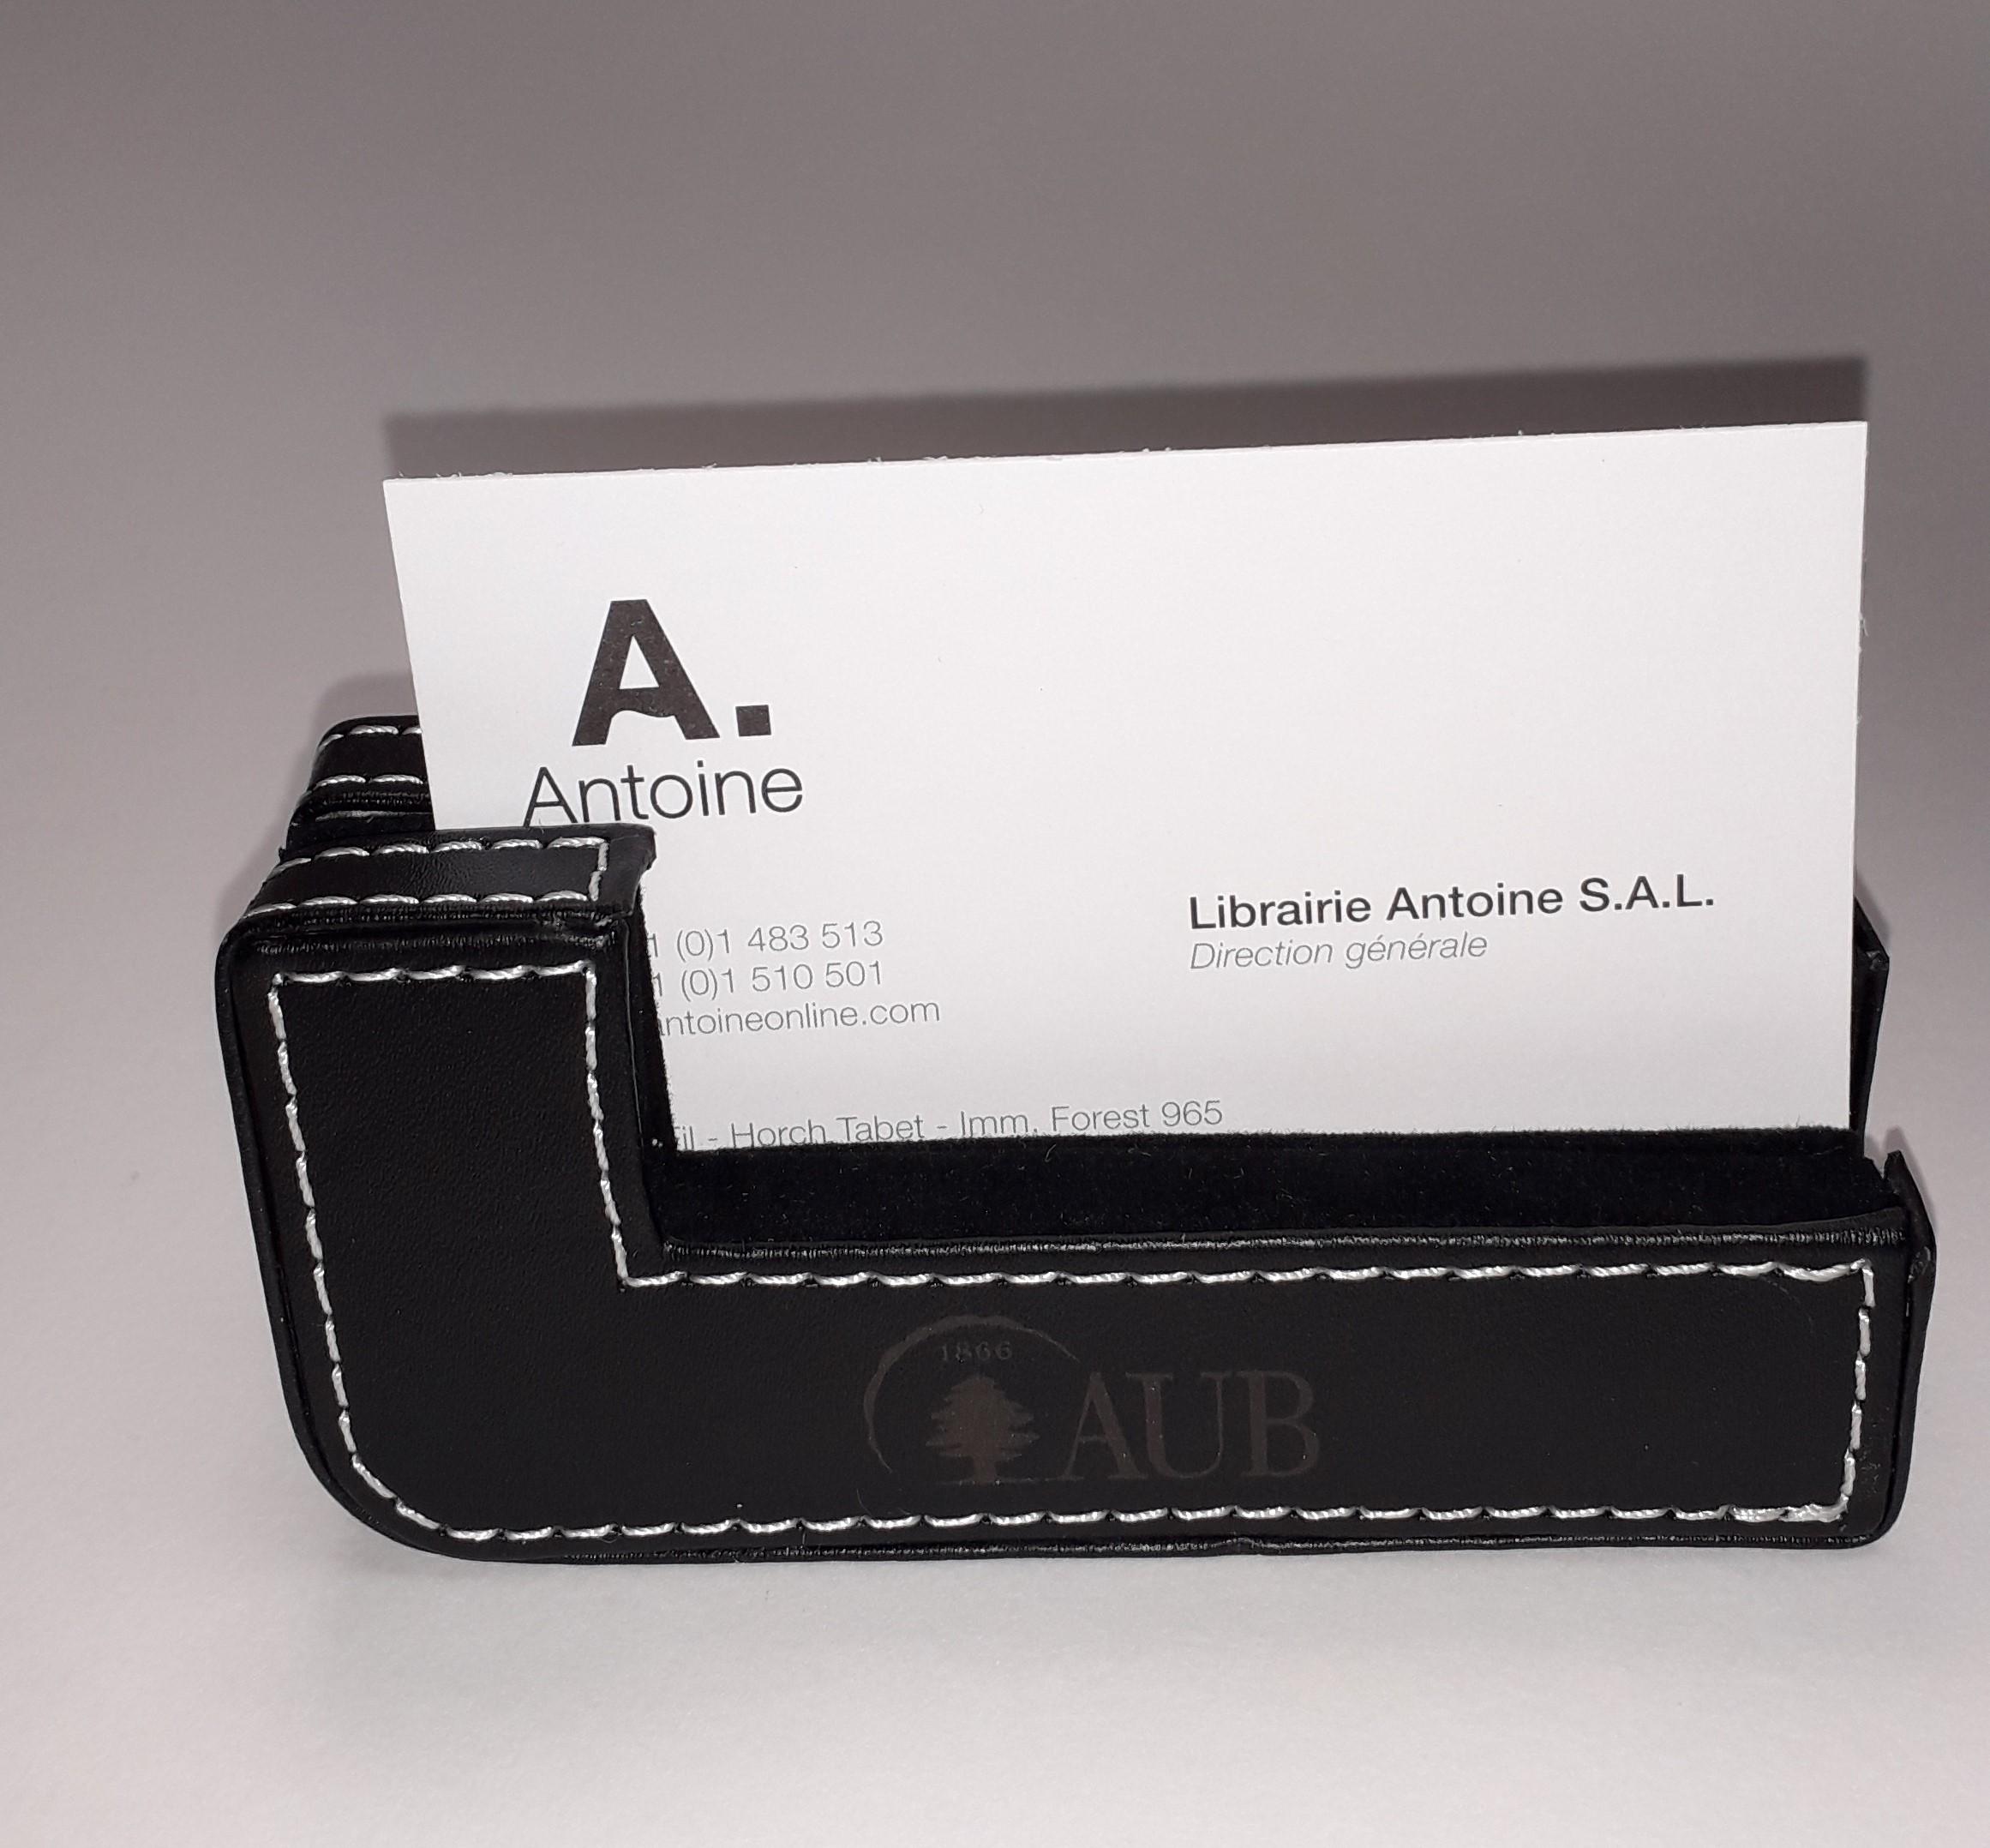 AUB Desk Card Holder Black